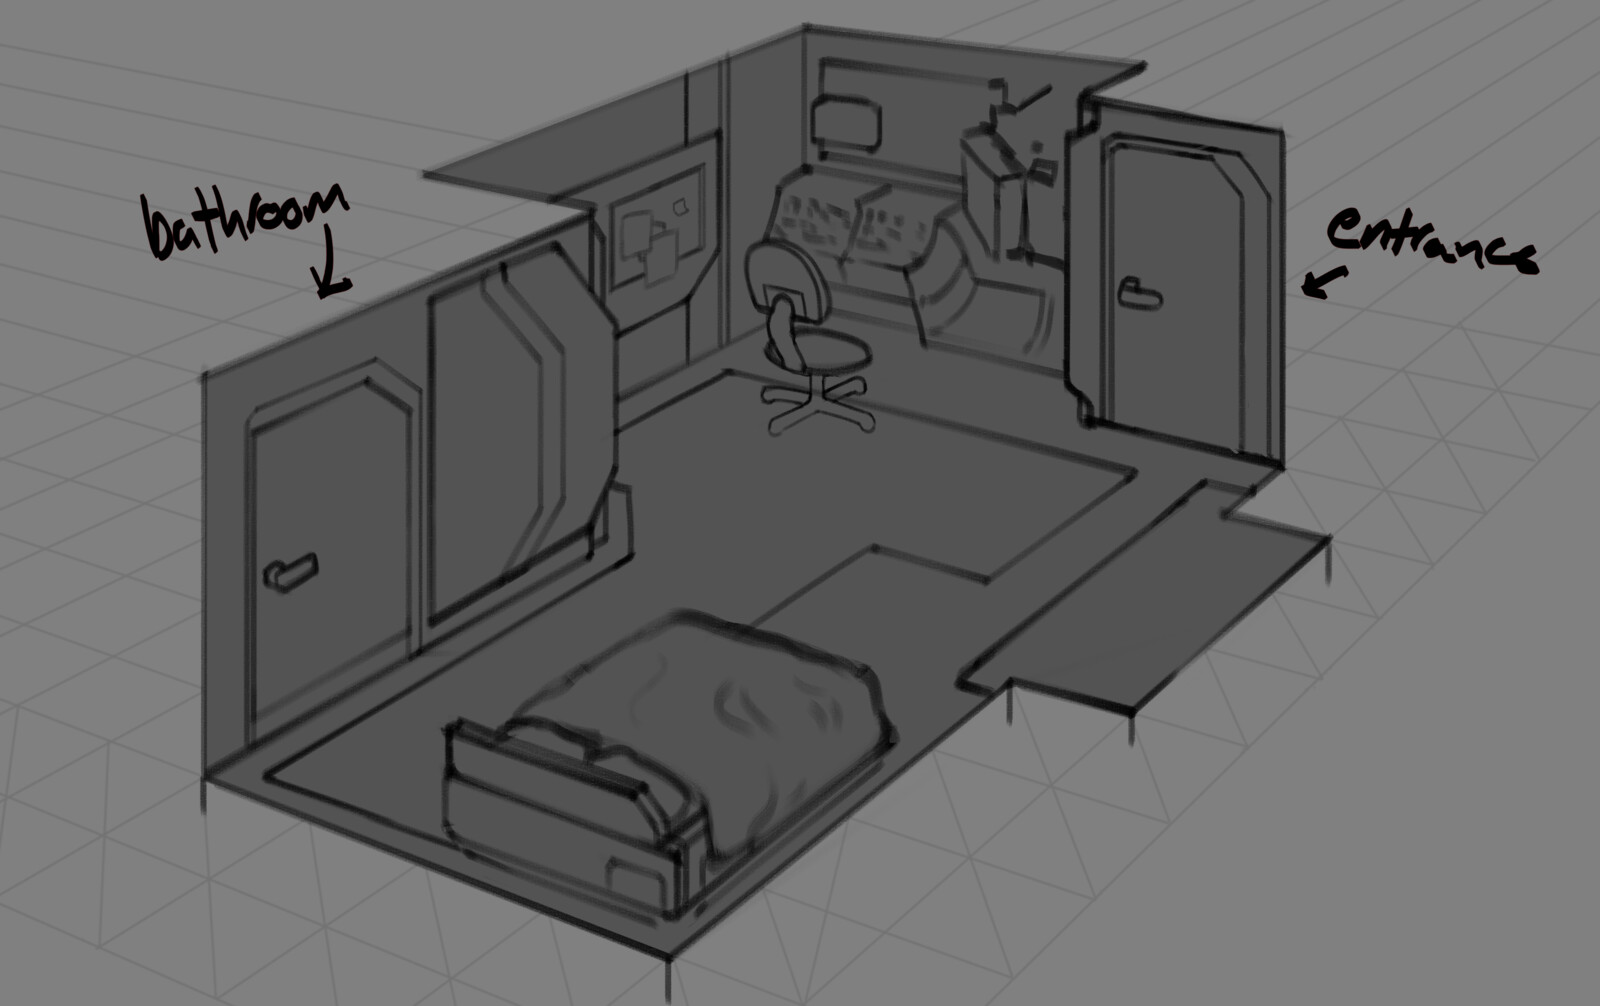 Alternate bedroom designs